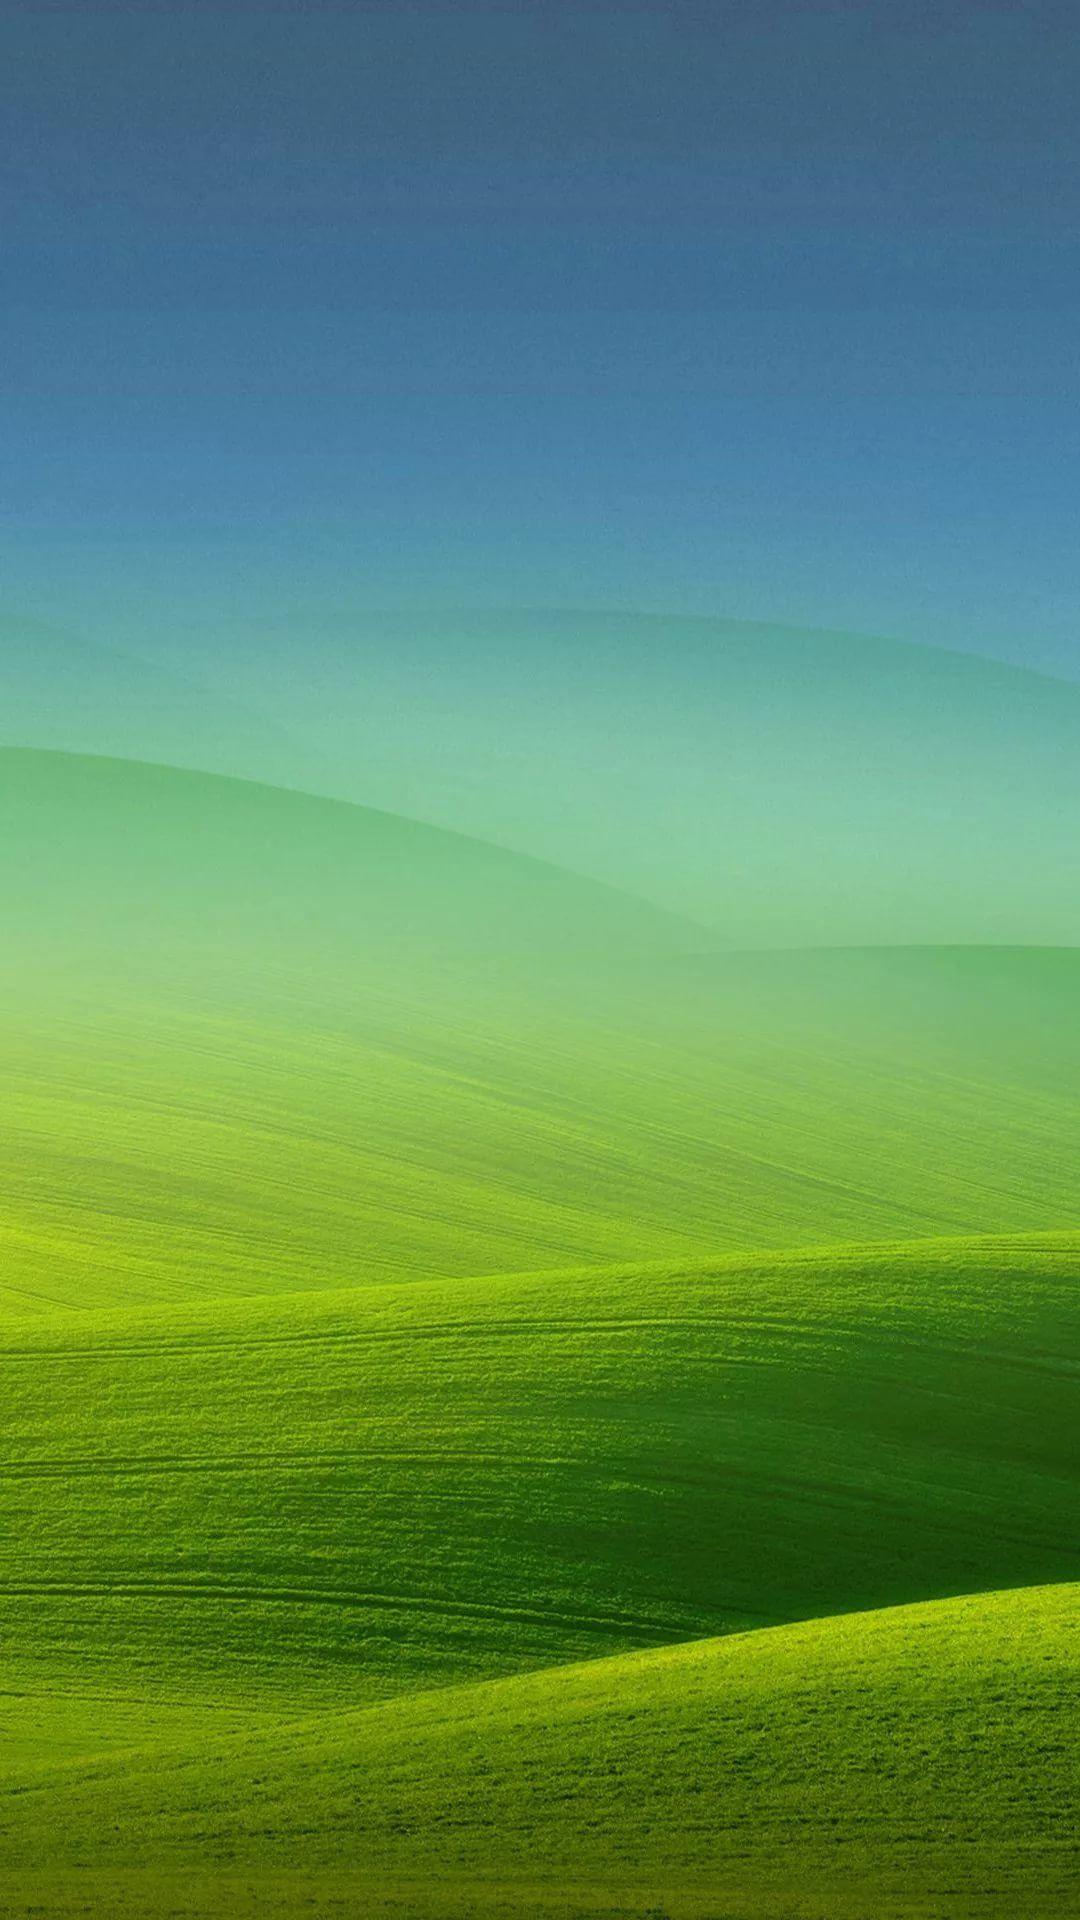 Nature Hd iPhone wallpaper